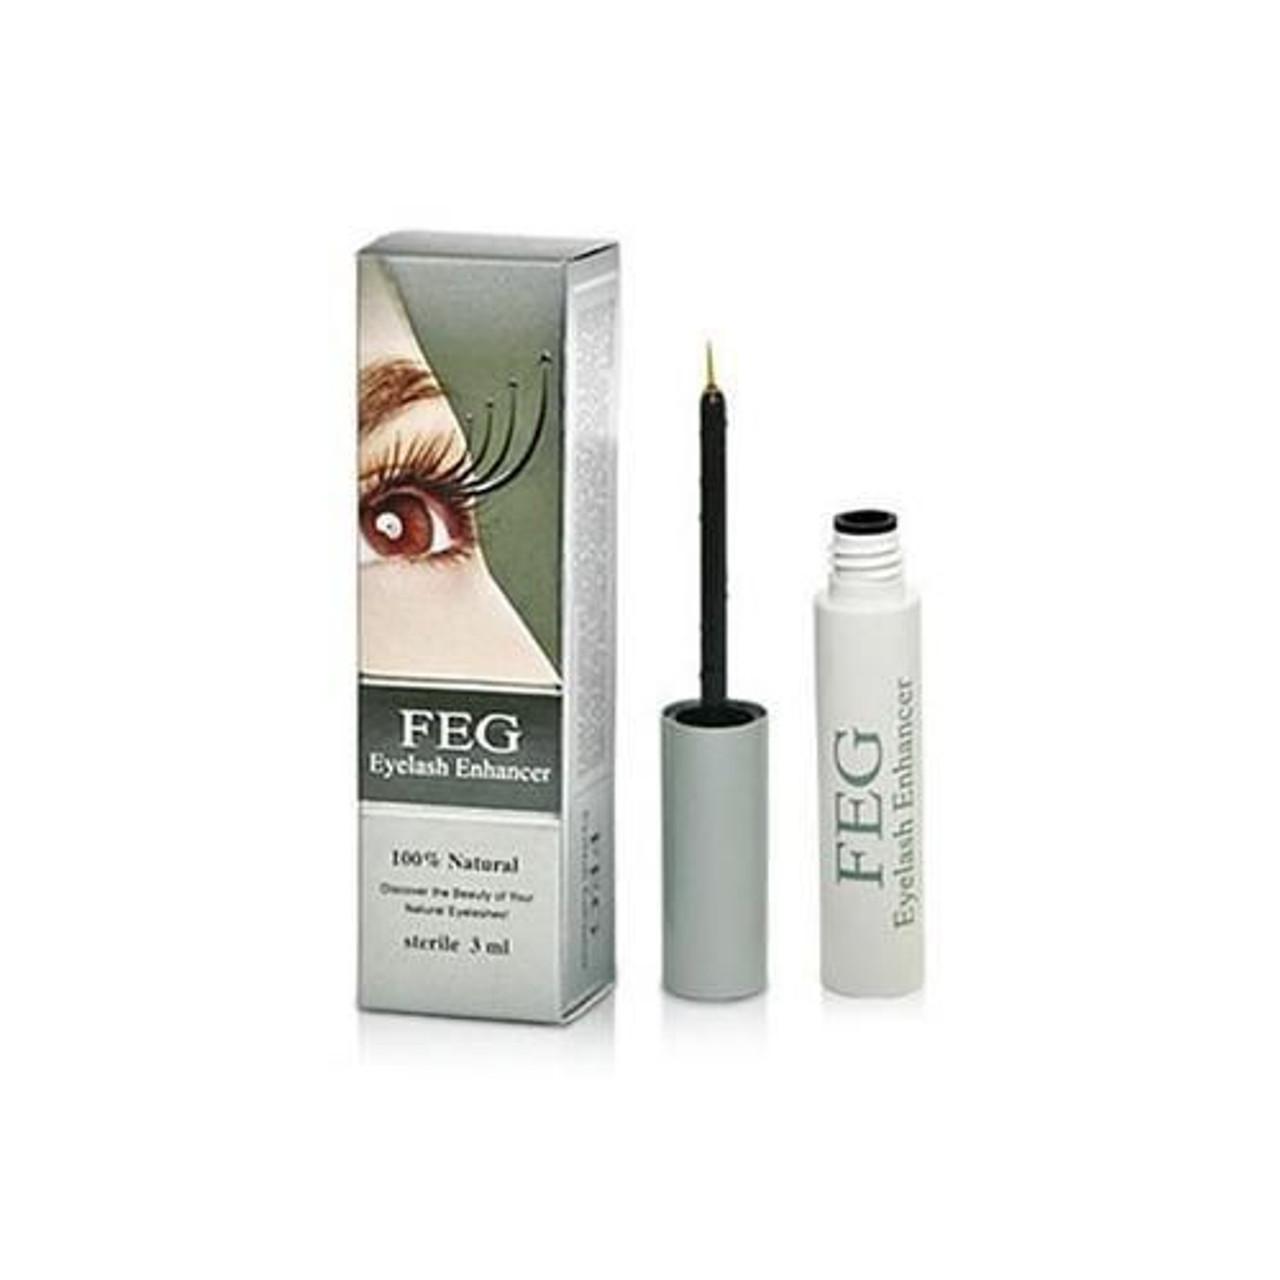 766ef843c52 FEG Eyelash Enhancer - iLashstore.com